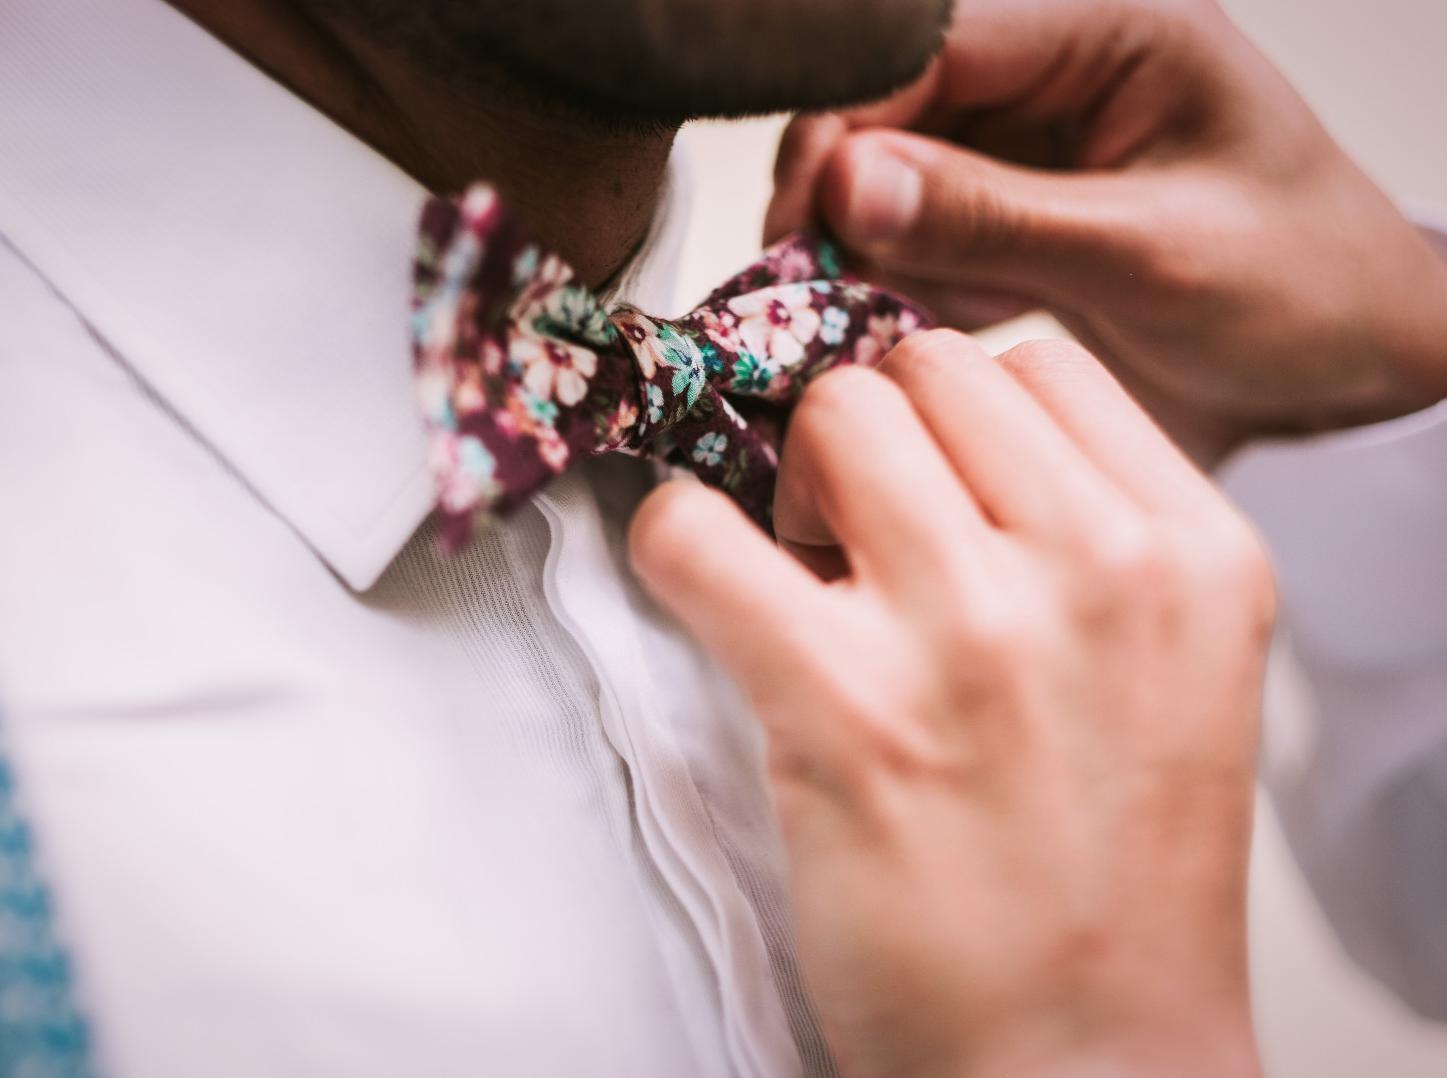 bodas-sin-clasificar-sin-tema-cuba-29181.jpg